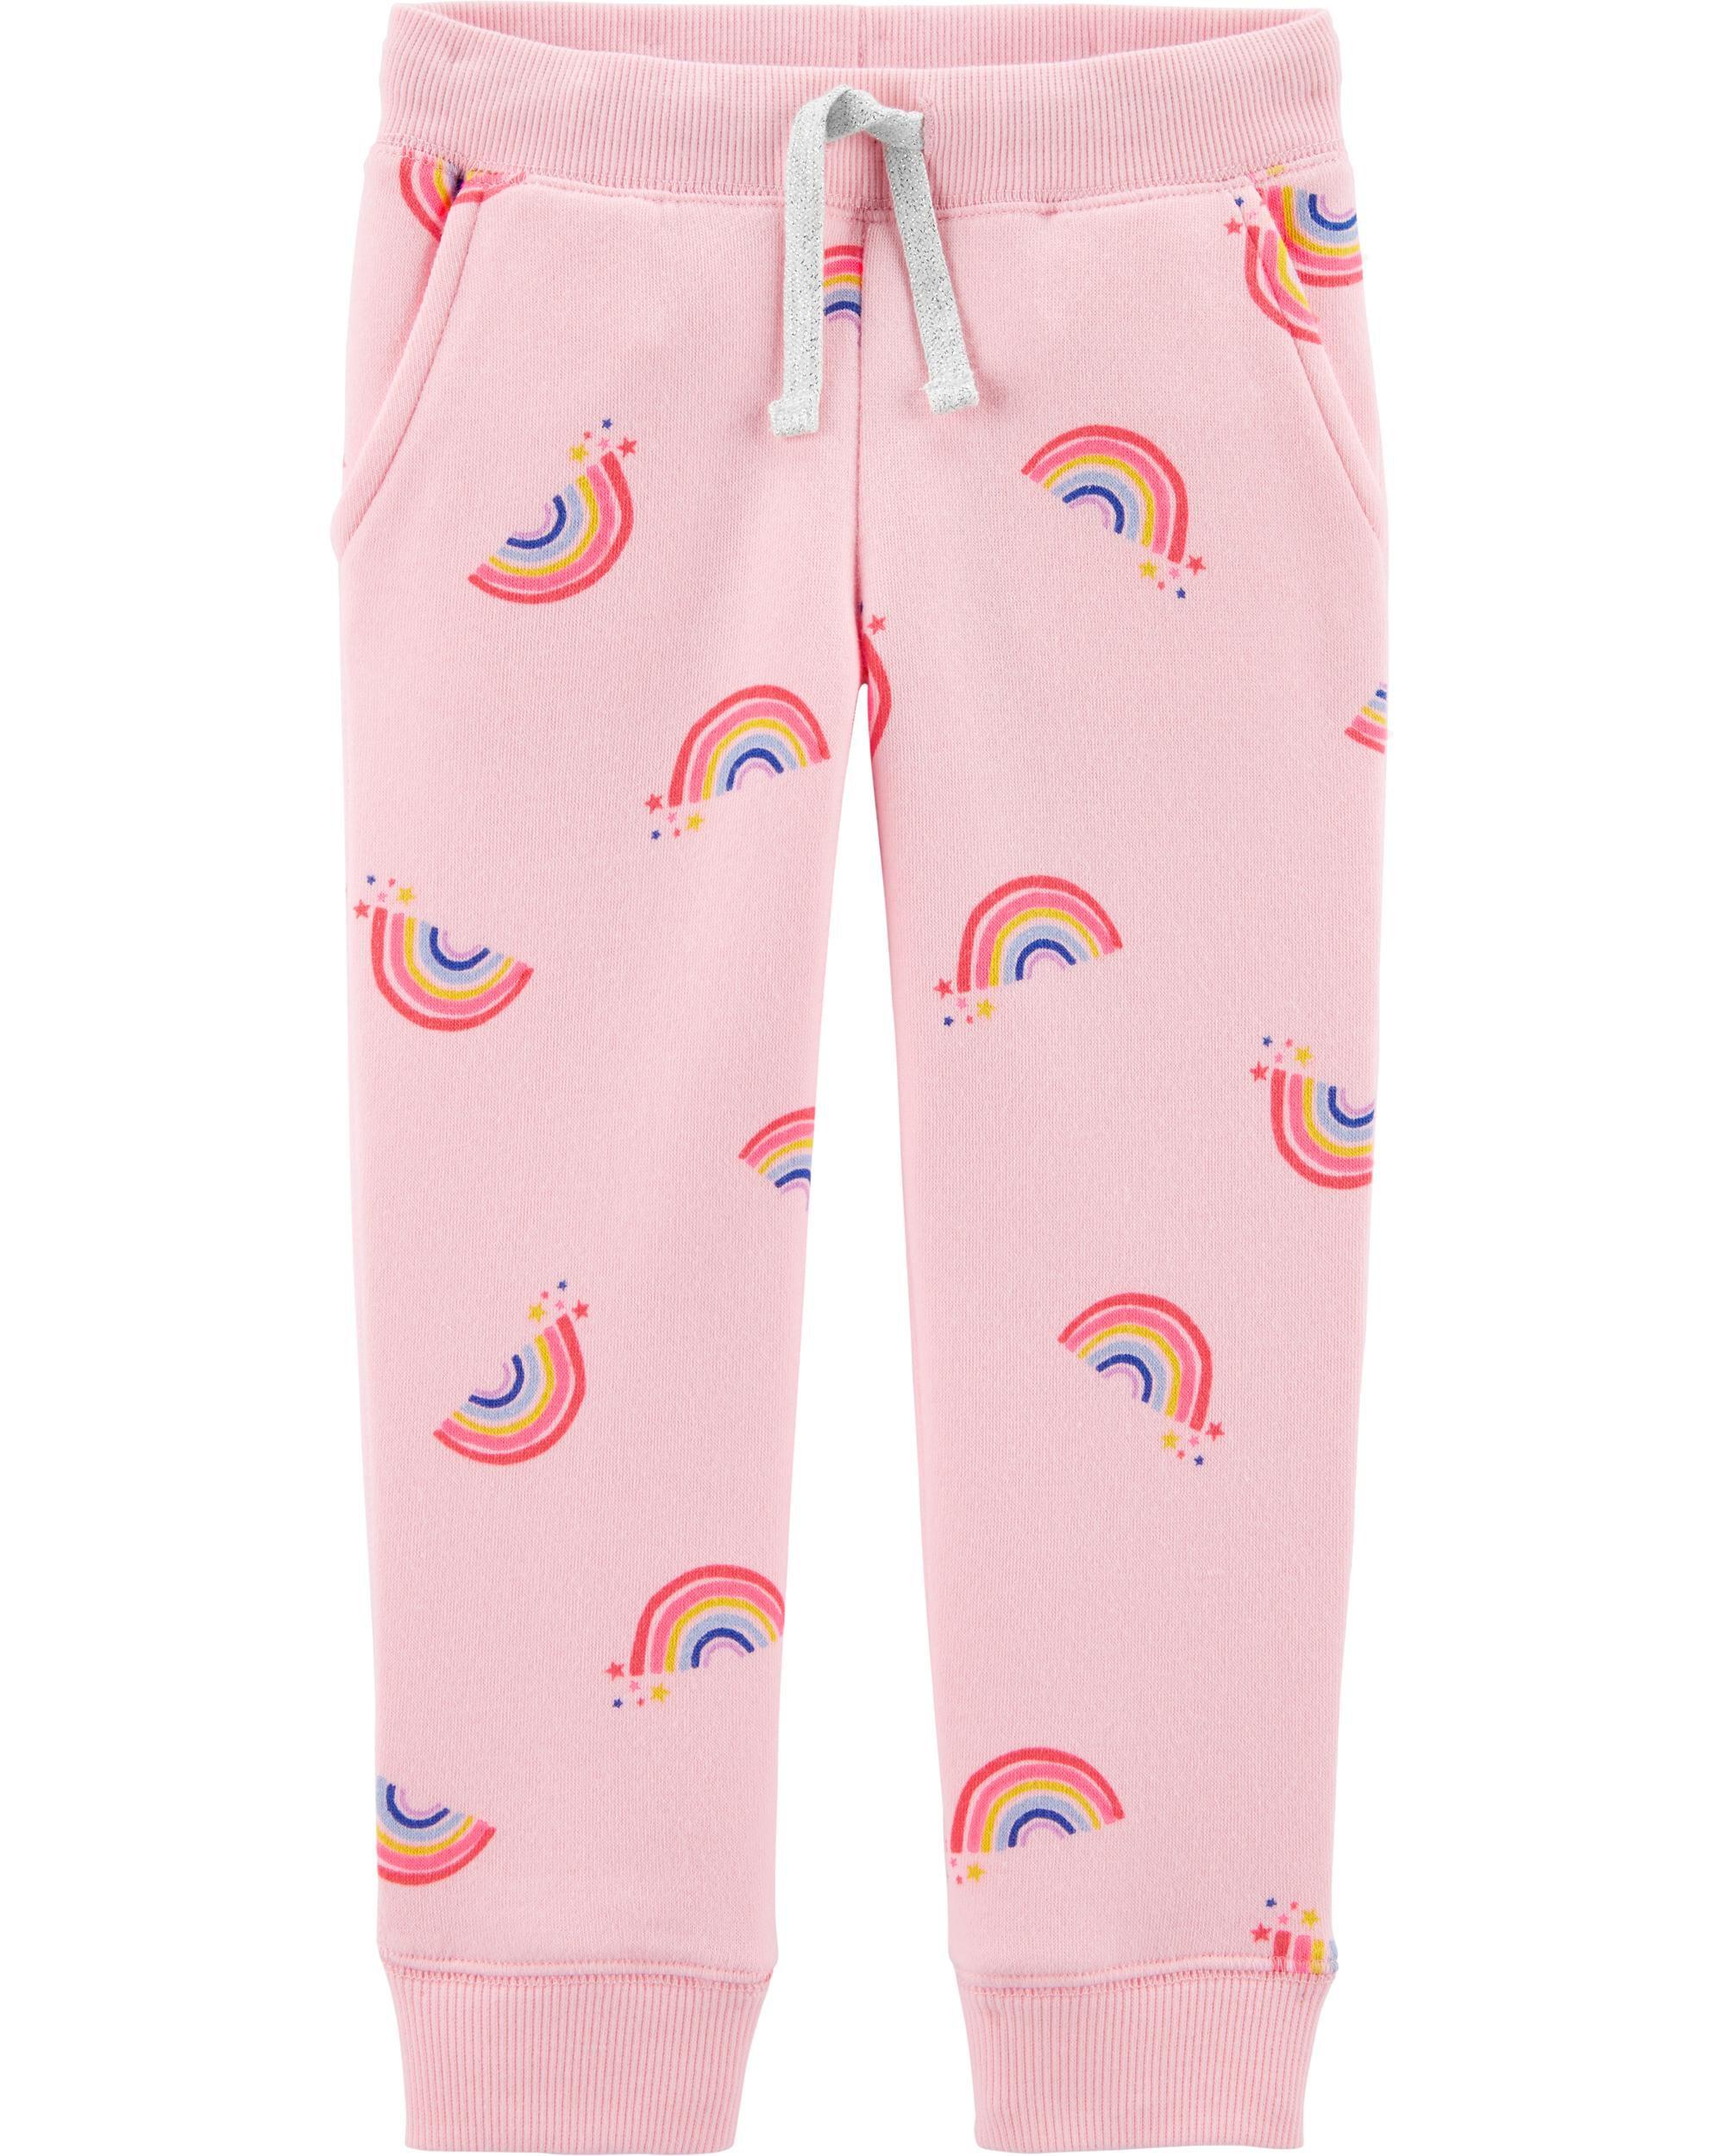 *CLEARANCE*Logo Fleece Rainbow Pants